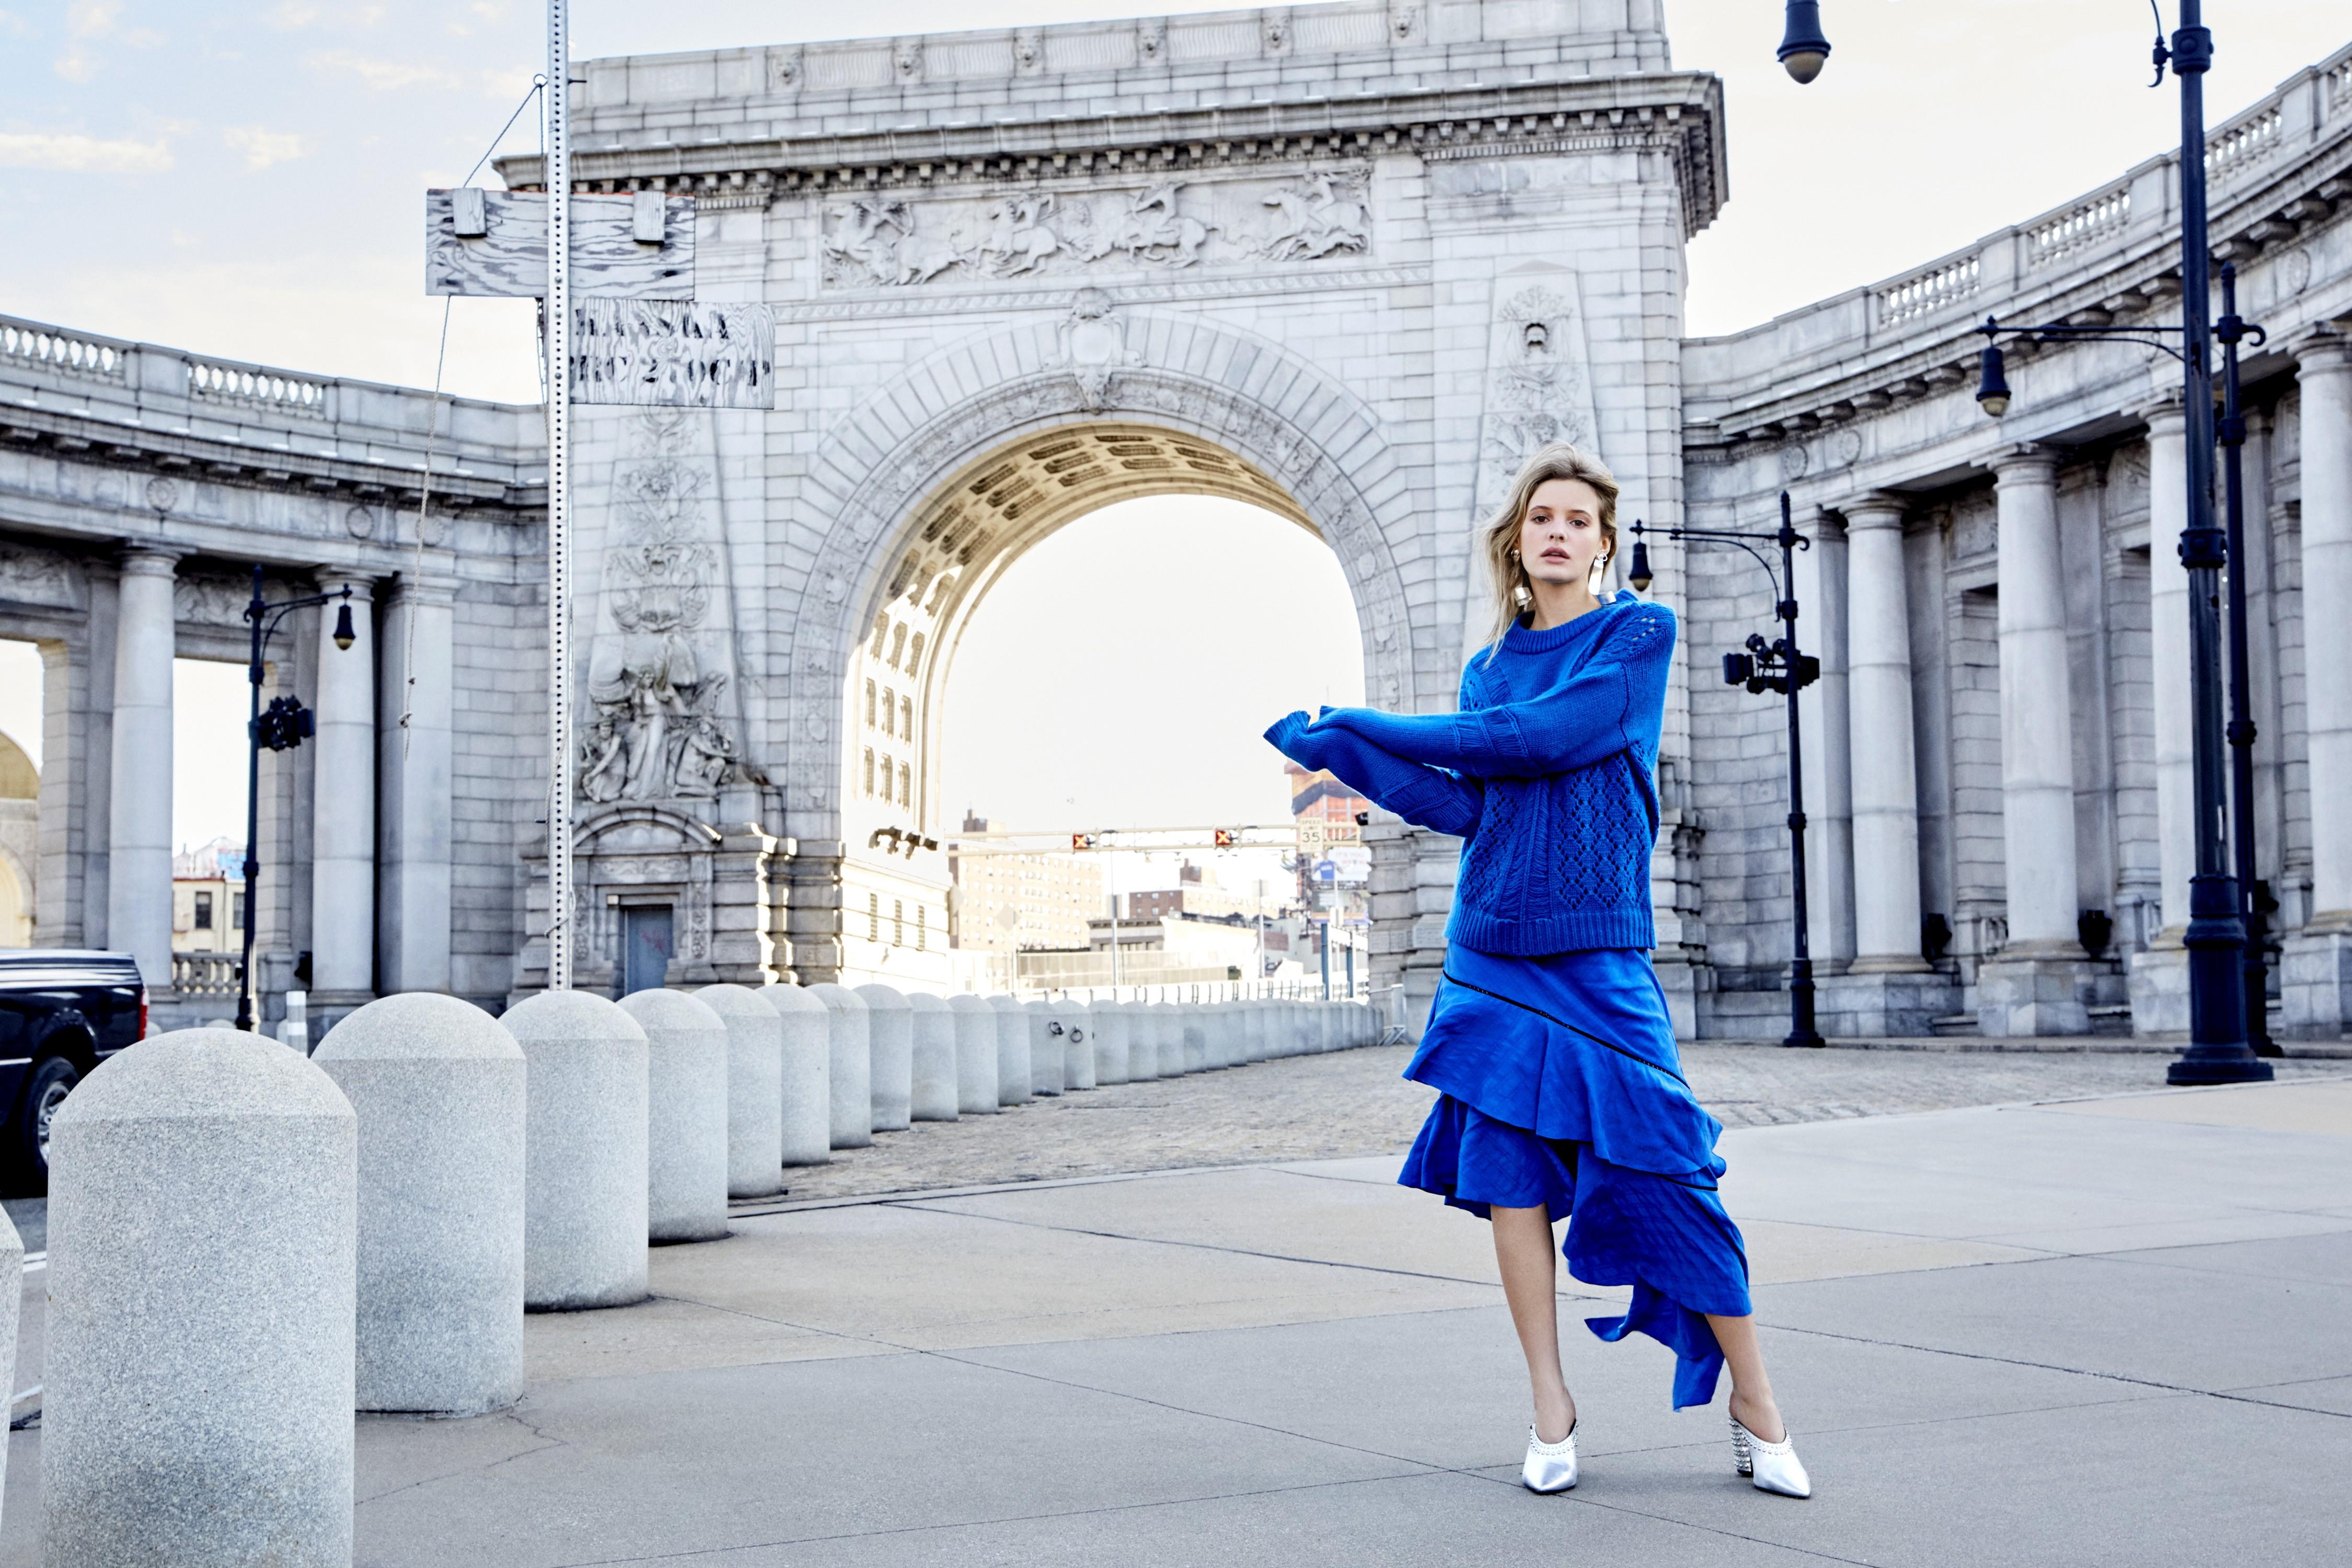 Paige by the Manhattan Bridge, 2016